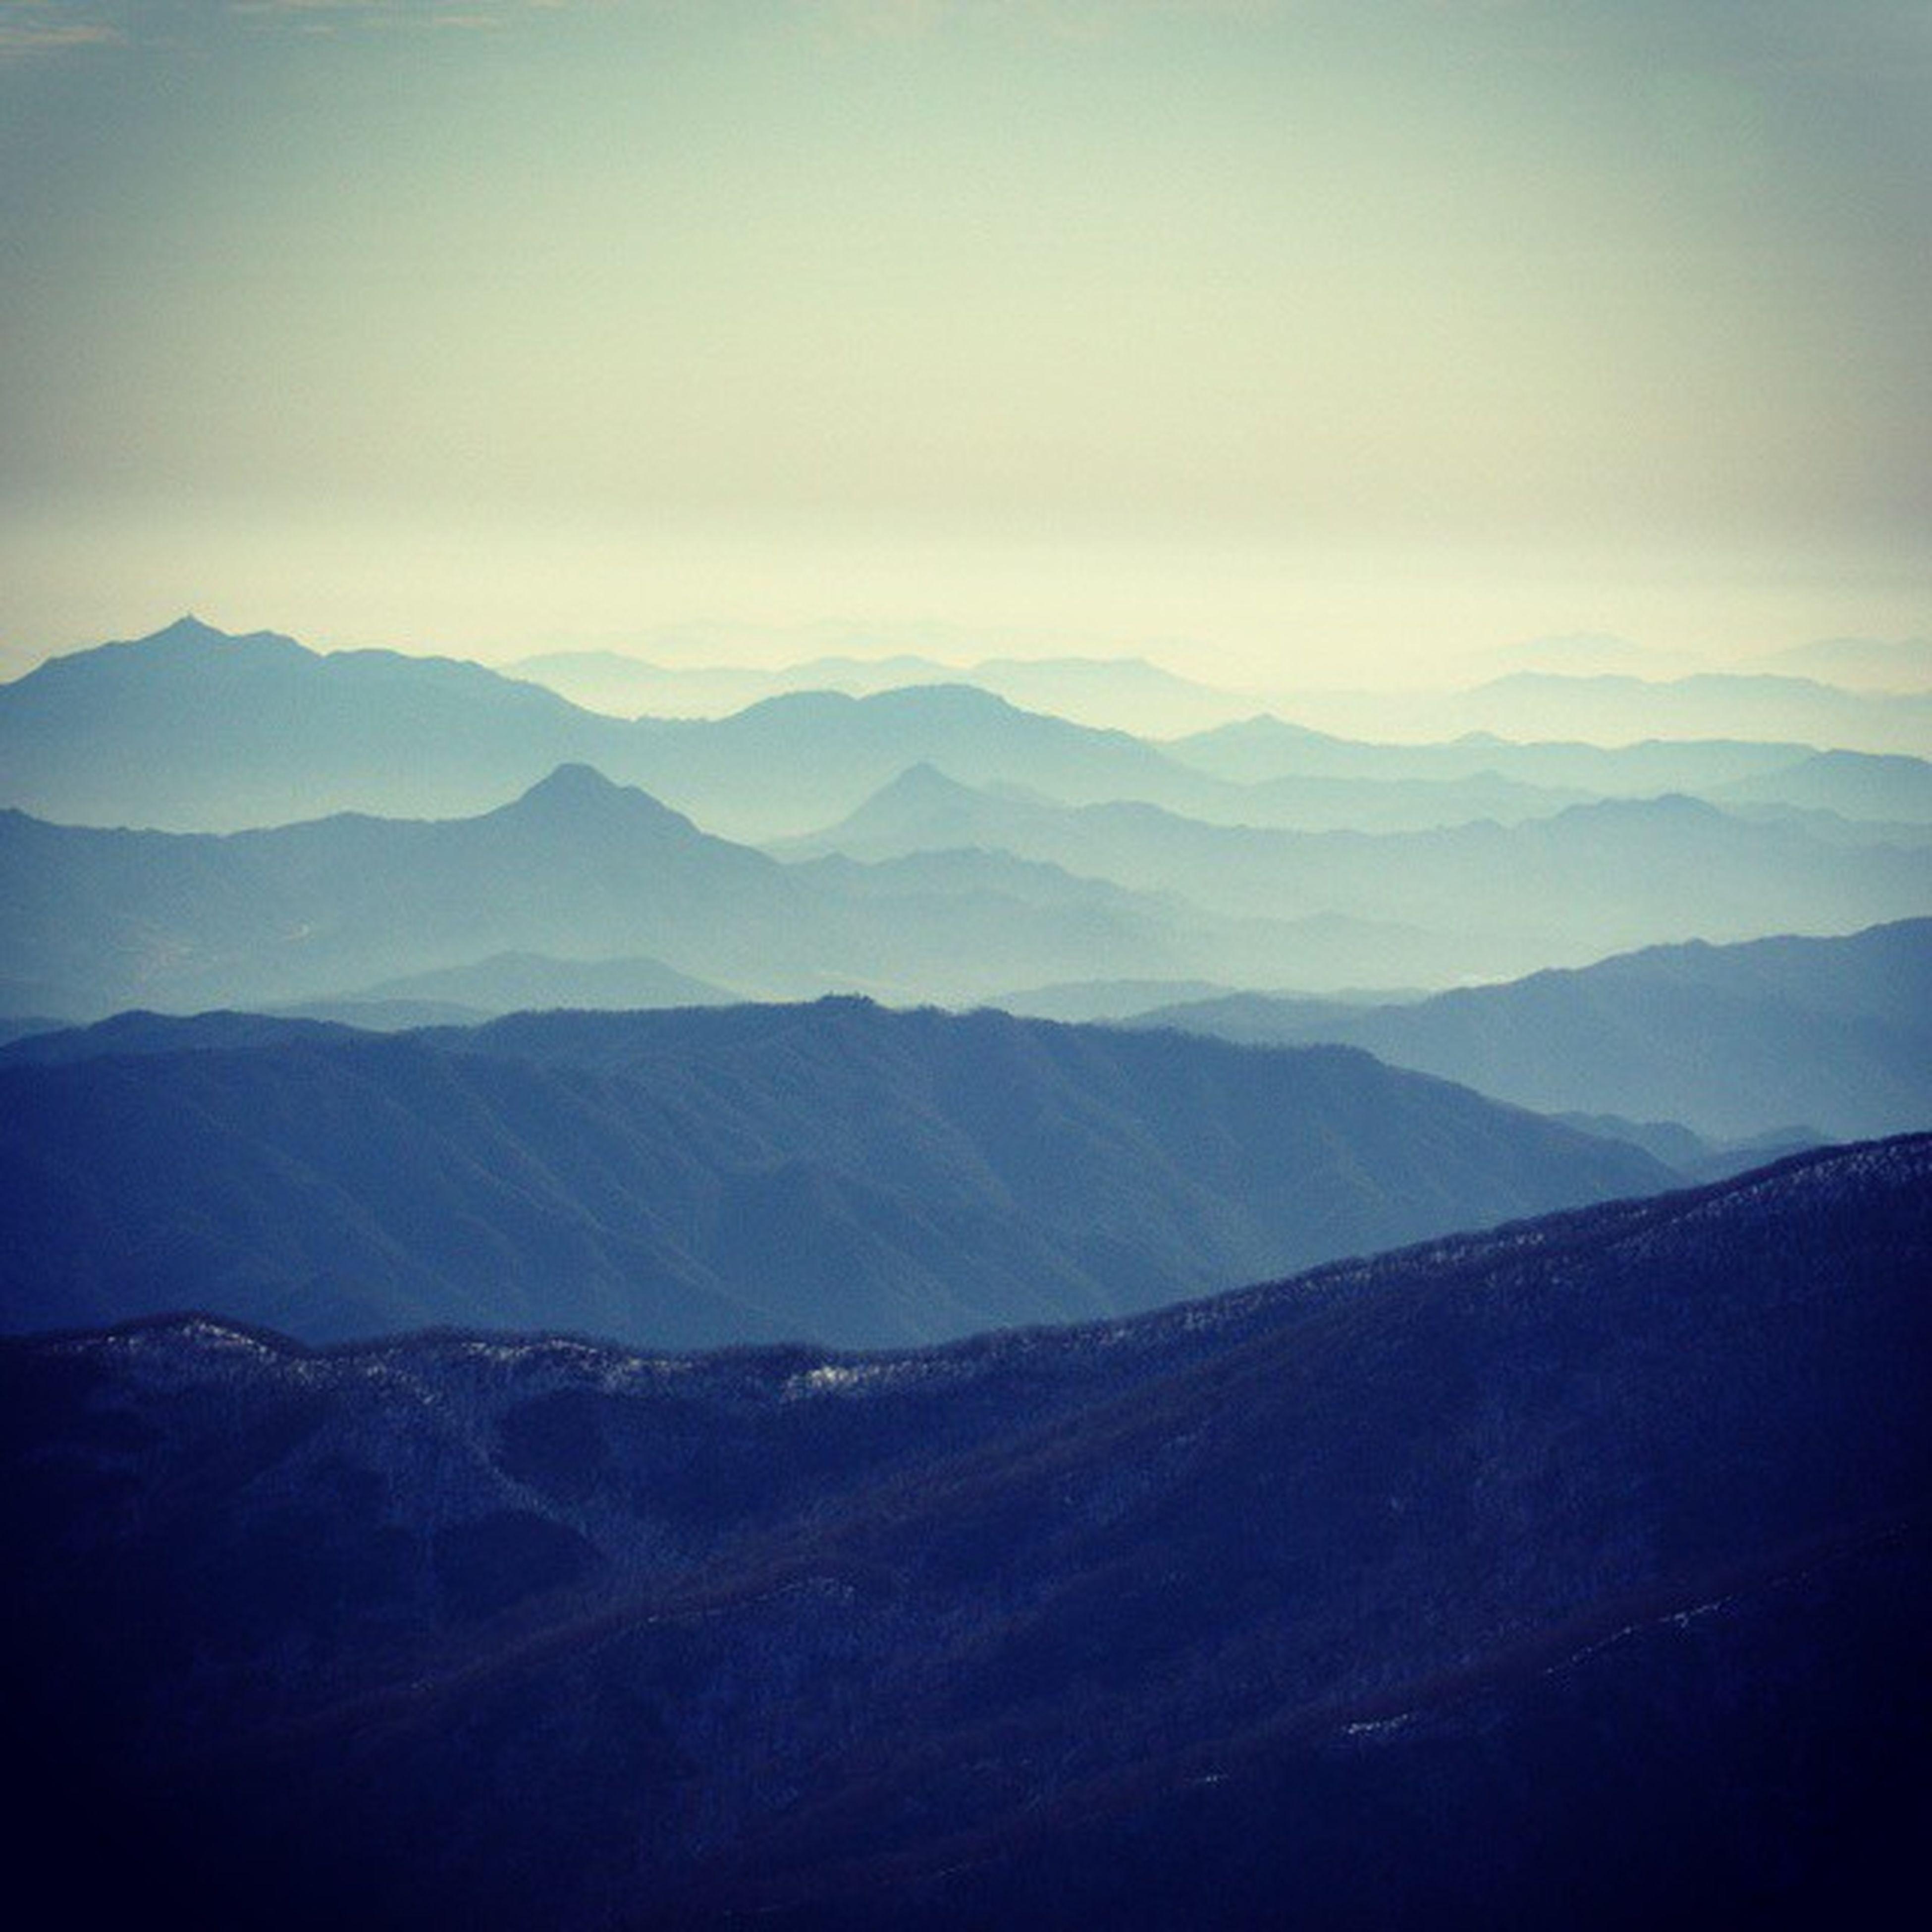 mountain, mountain range, tranquil scene, tranquility, scenics, landscape, beauty in nature, sky, nature, non-urban scene, idyllic, remote, outdoors, no people, cloud - sky, day, cloud, non urban scene, majestic, fog